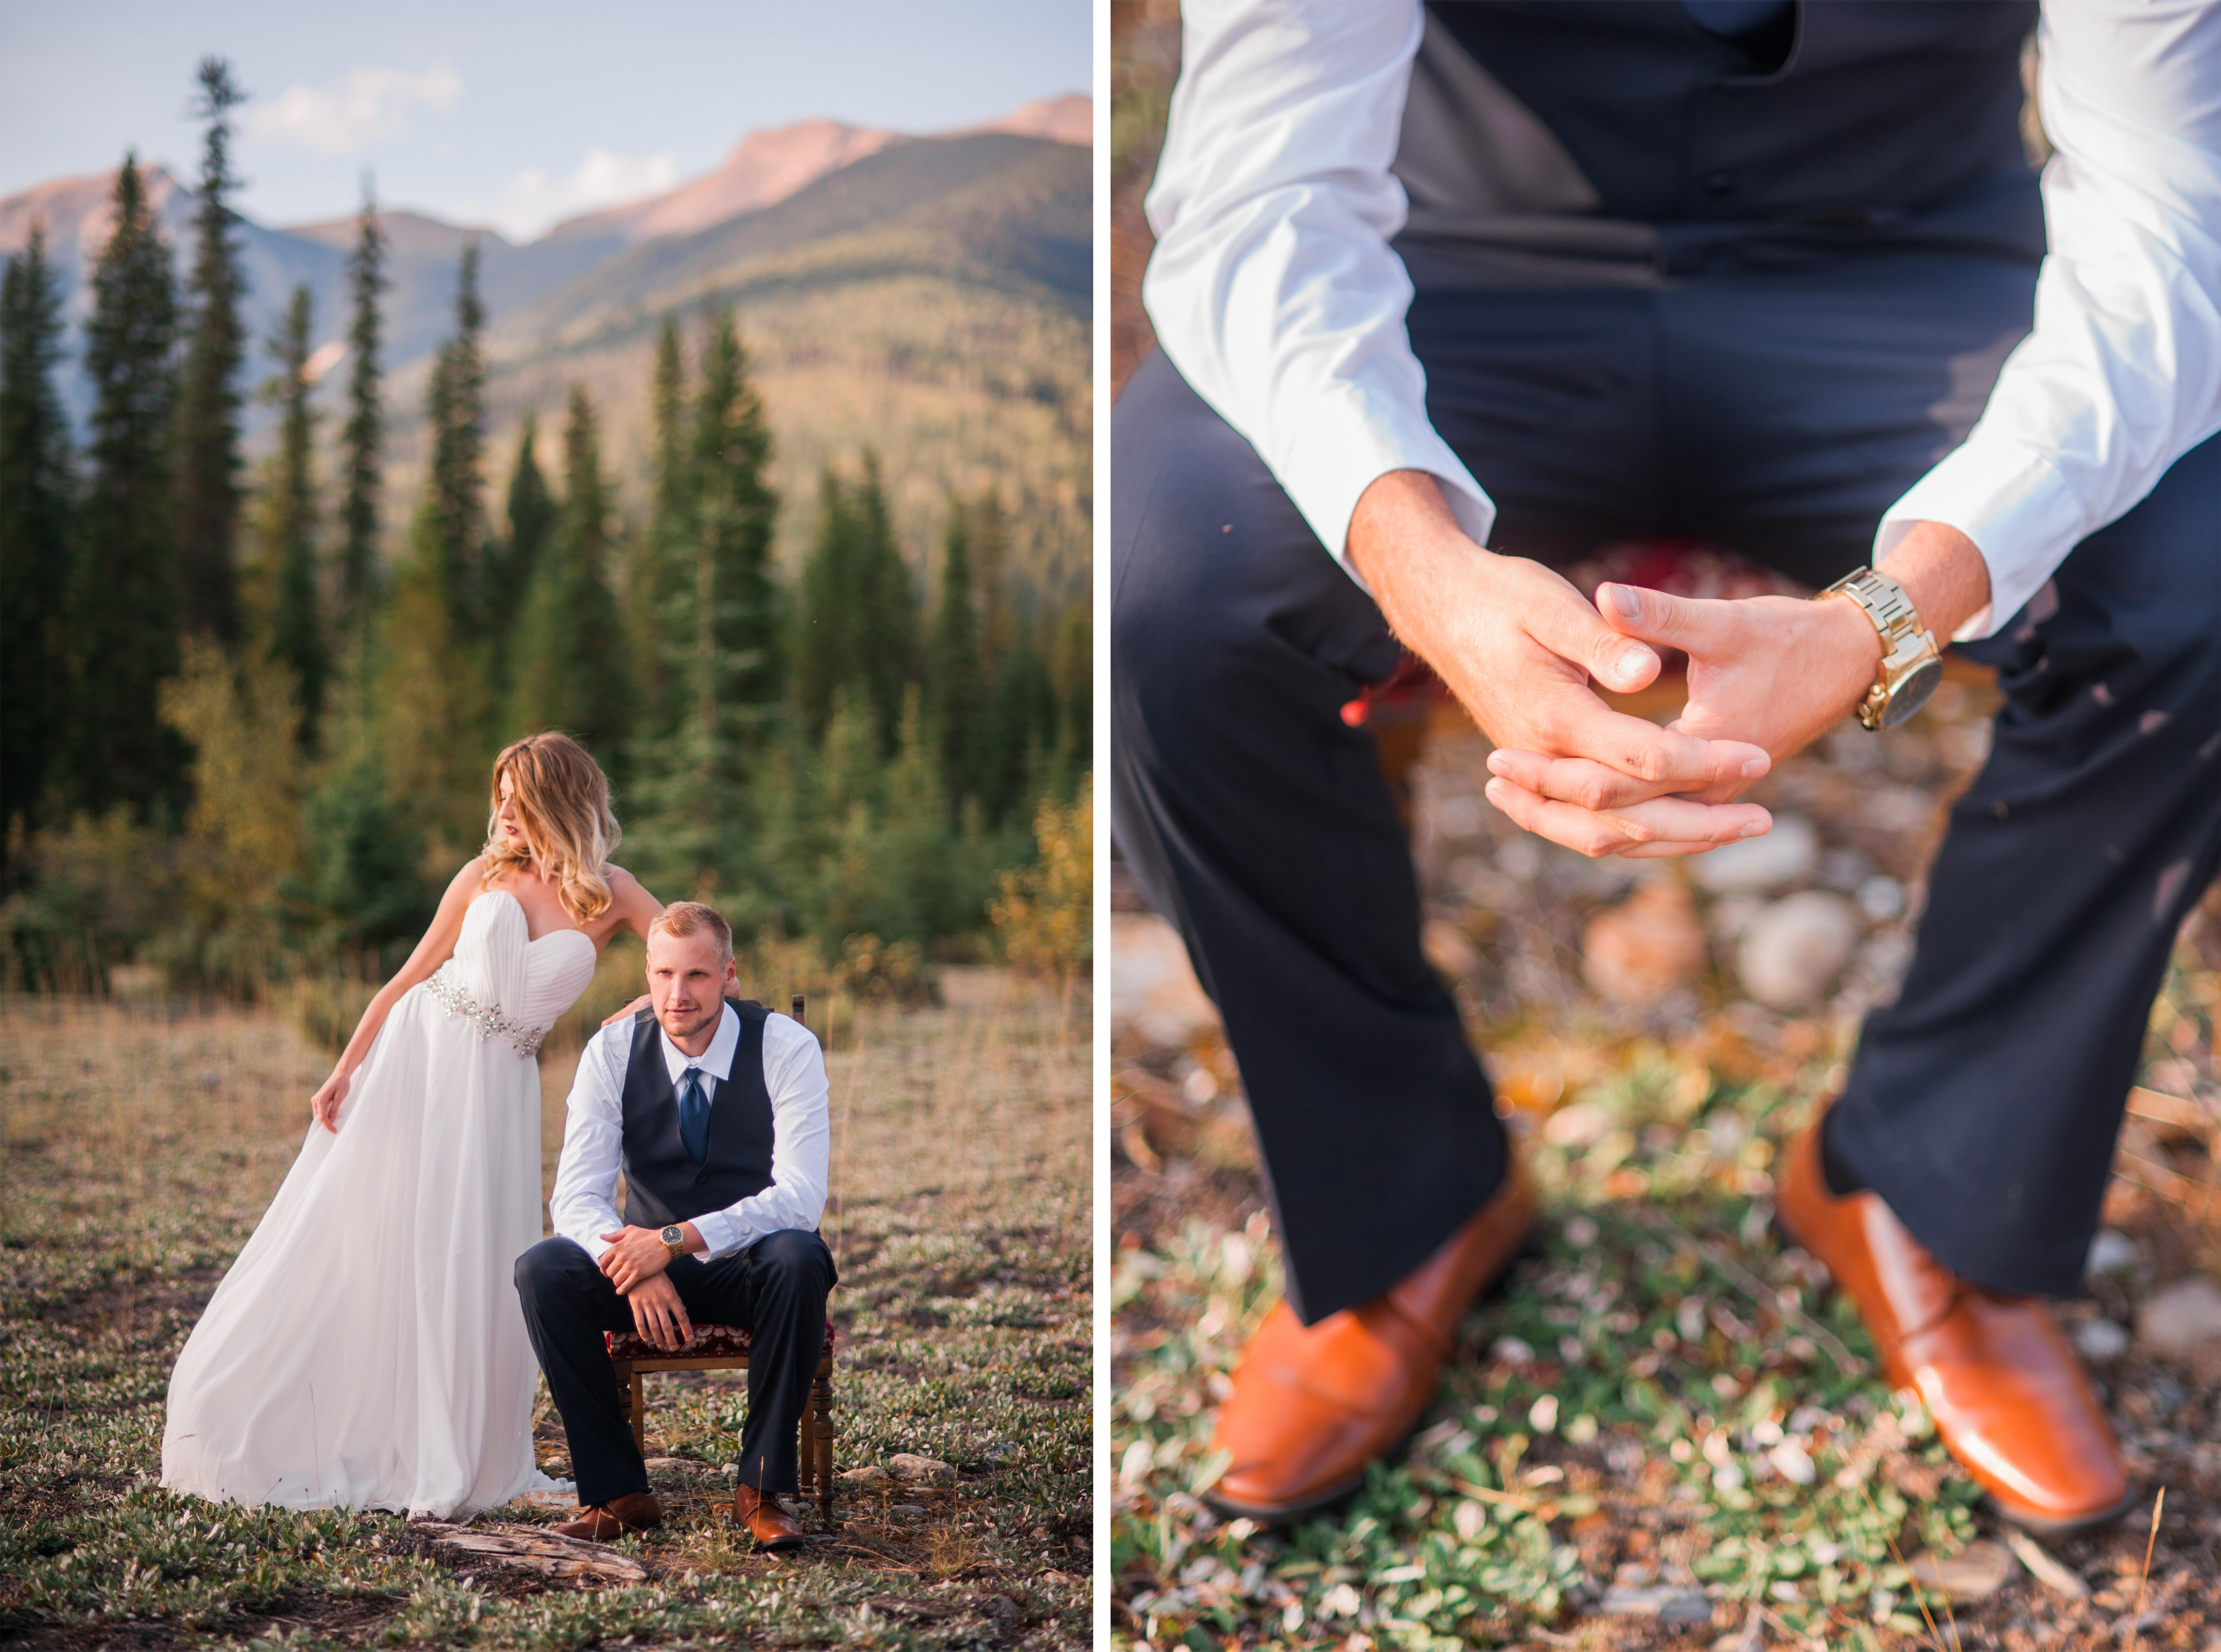 13-wedding-workshop-retreat-in-golden-bc-rhiannon-sarah-photography